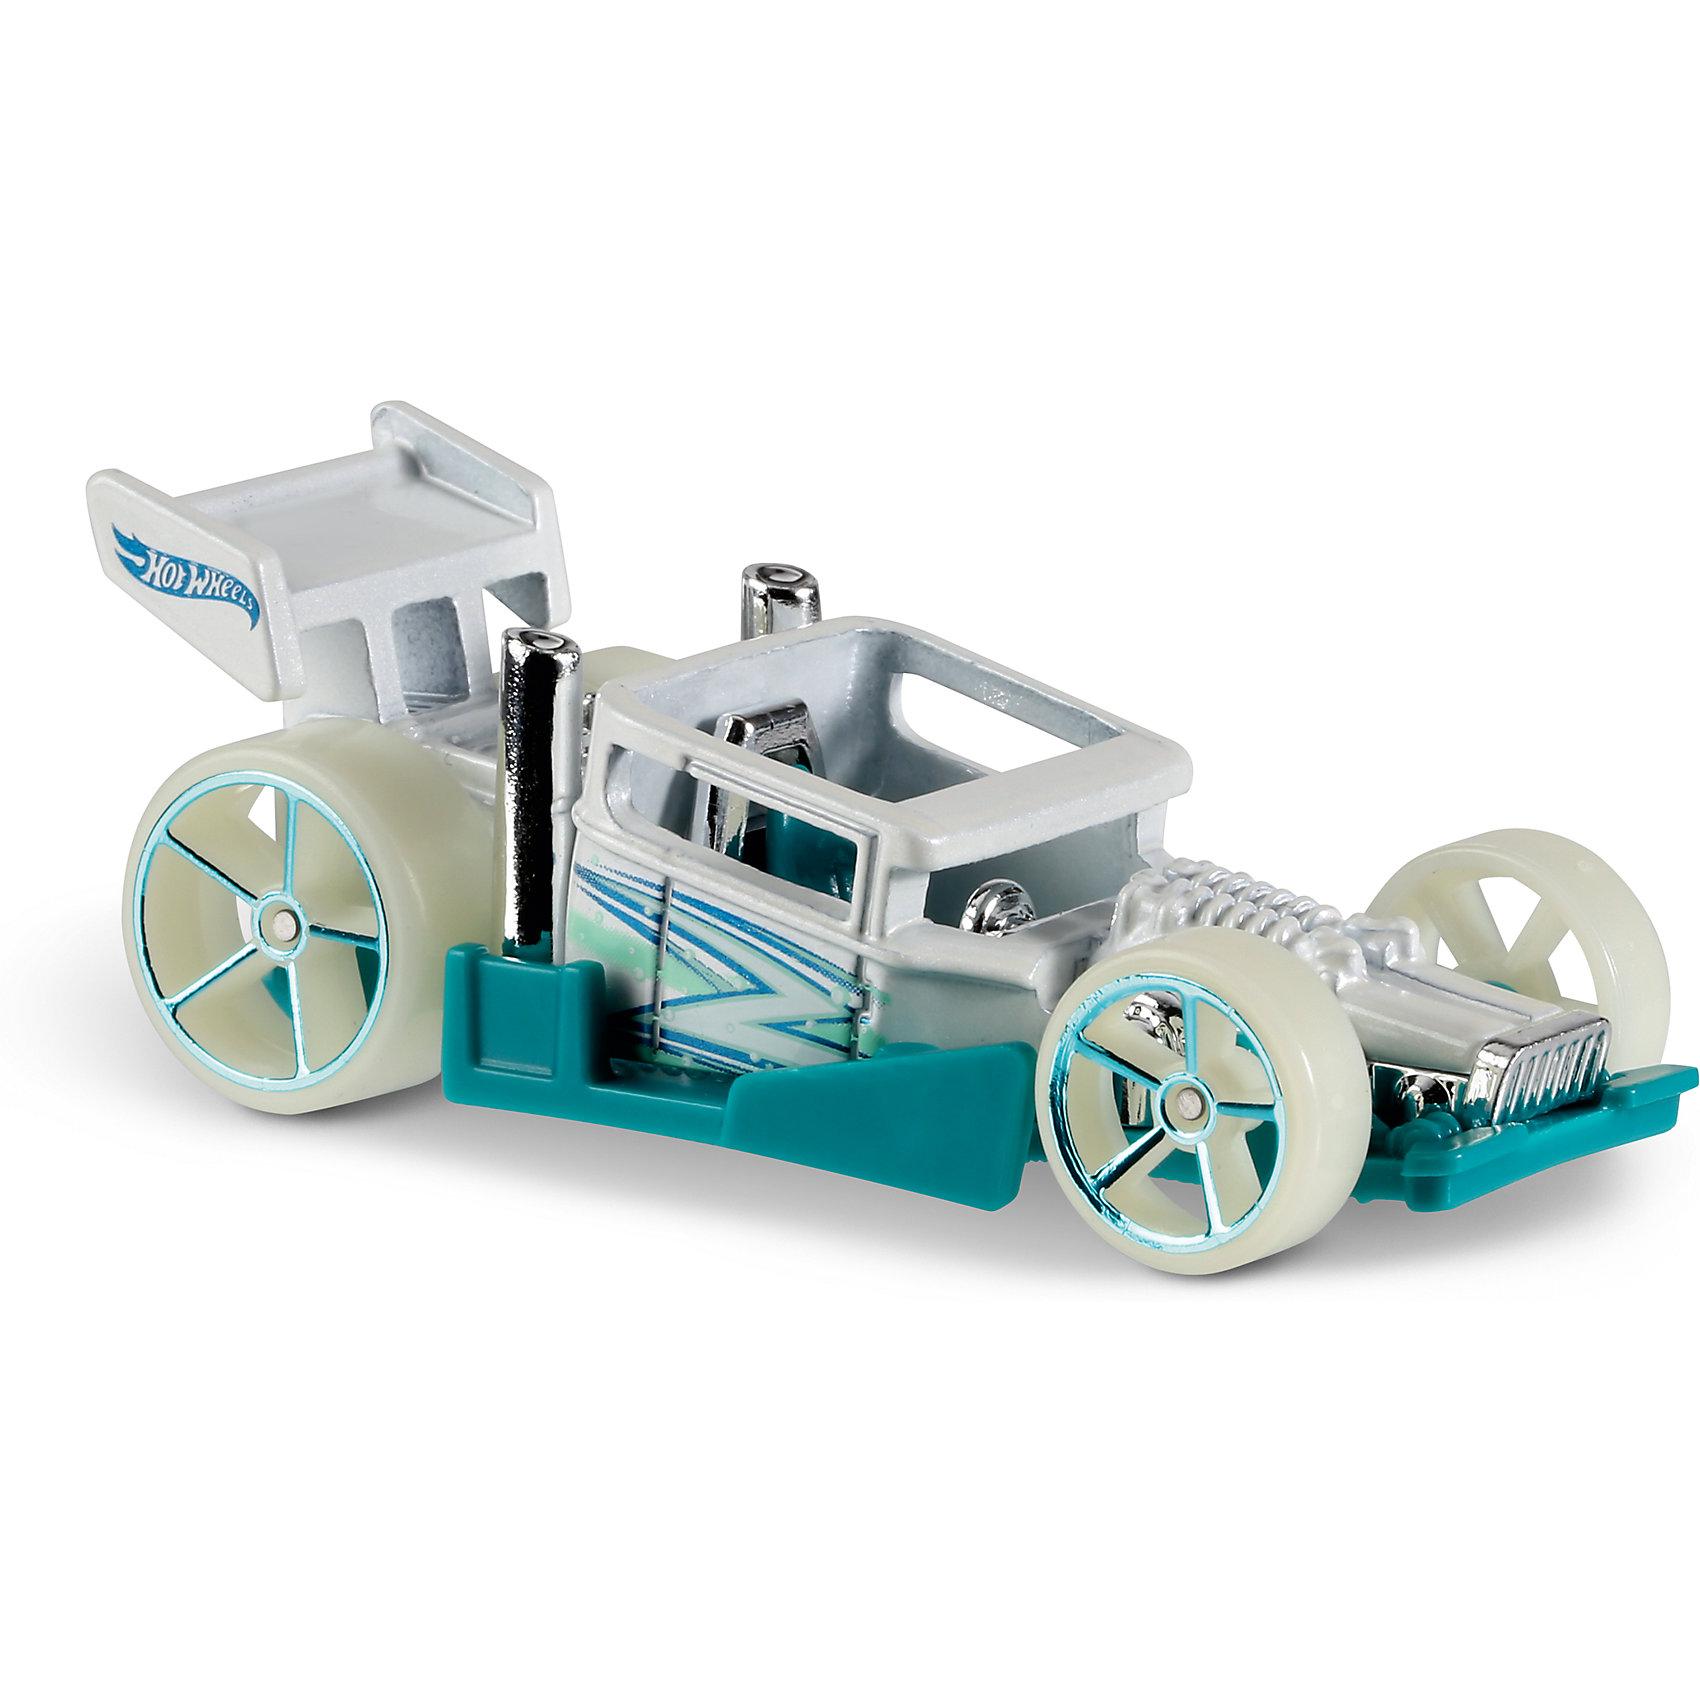 Базовая машинка Hot Wheels, Bone SpeederМашинки<br><br><br>Ширина мм: 110<br>Глубина мм: 45<br>Высота мм: 110<br>Вес г: 30<br>Возраст от месяцев: 36<br>Возраст до месяцев: 96<br>Пол: Мужской<br>Возраст: Детский<br>SKU: 7111099